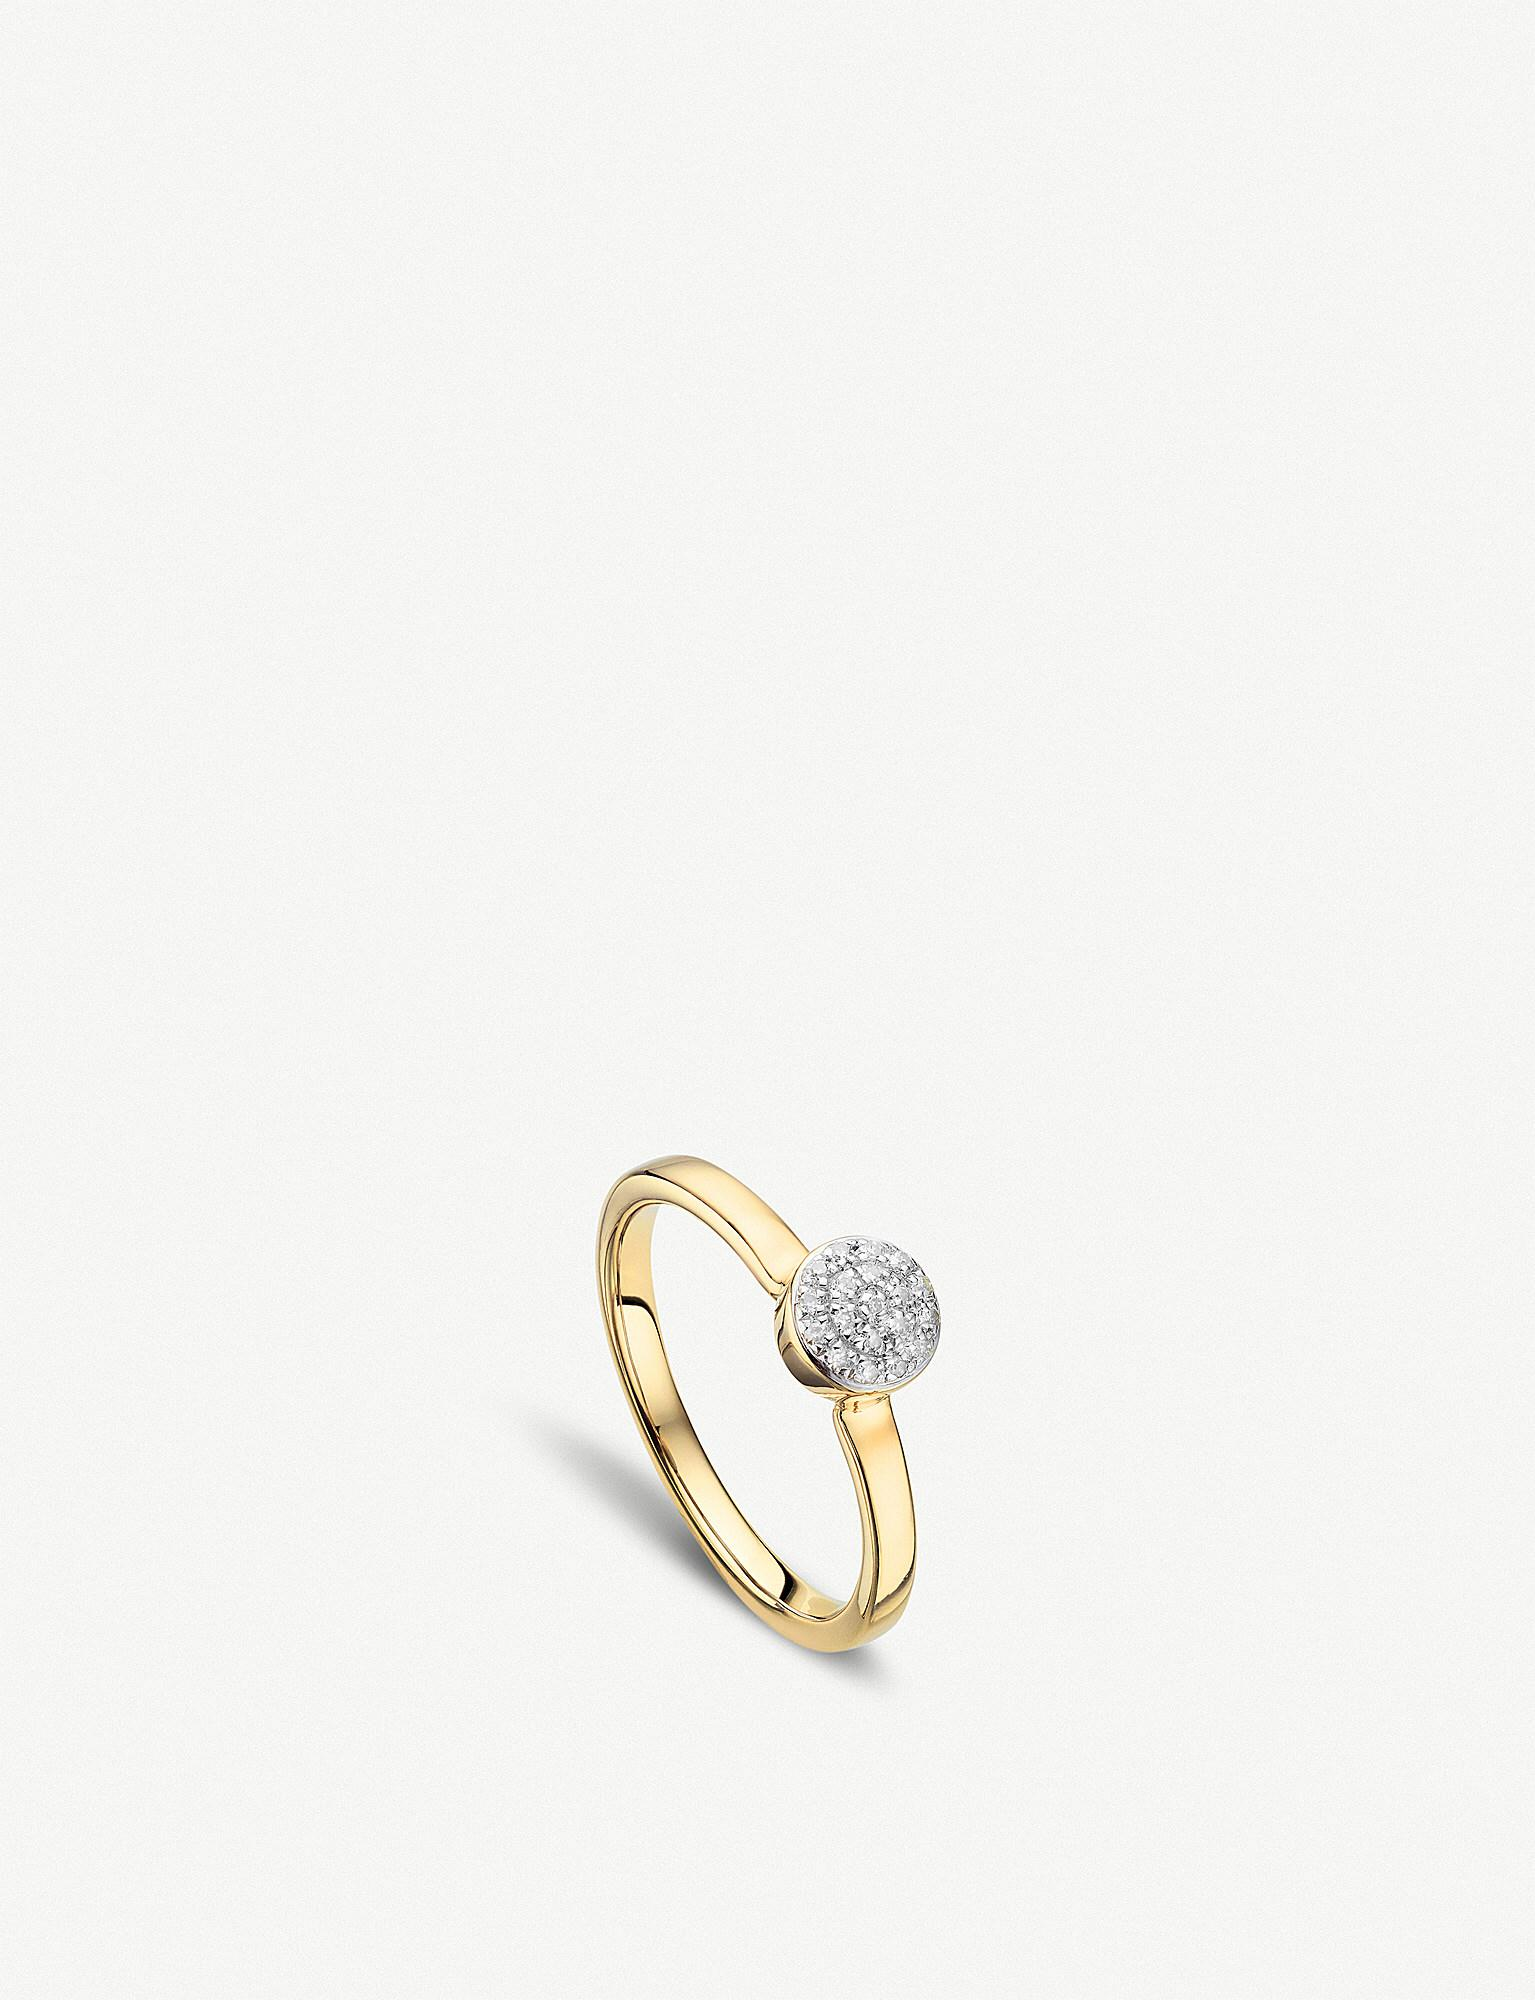 Rose Gold Fiji Large Button Stacking Ring Diamond Monica Vinader fvVCvETX